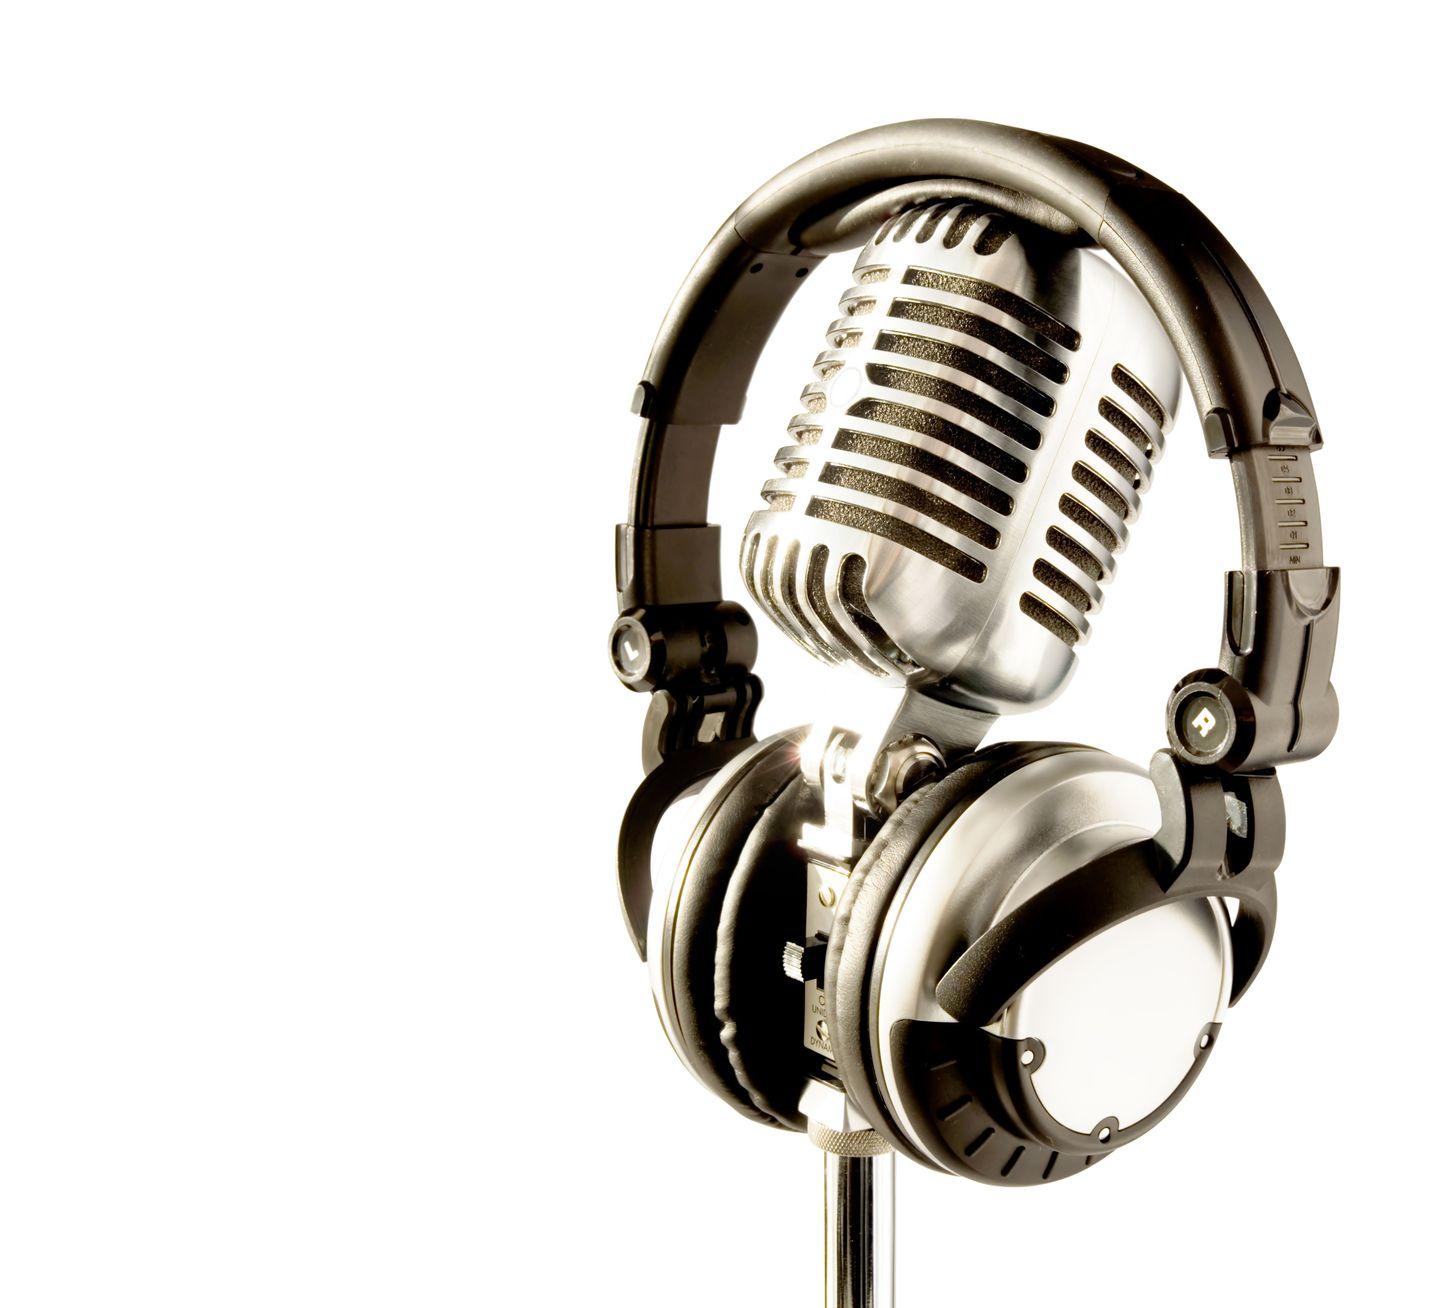 professional retro microphone dj headphones flickr photo sharing. Black Bedroom Furniture Sets. Home Design Ideas